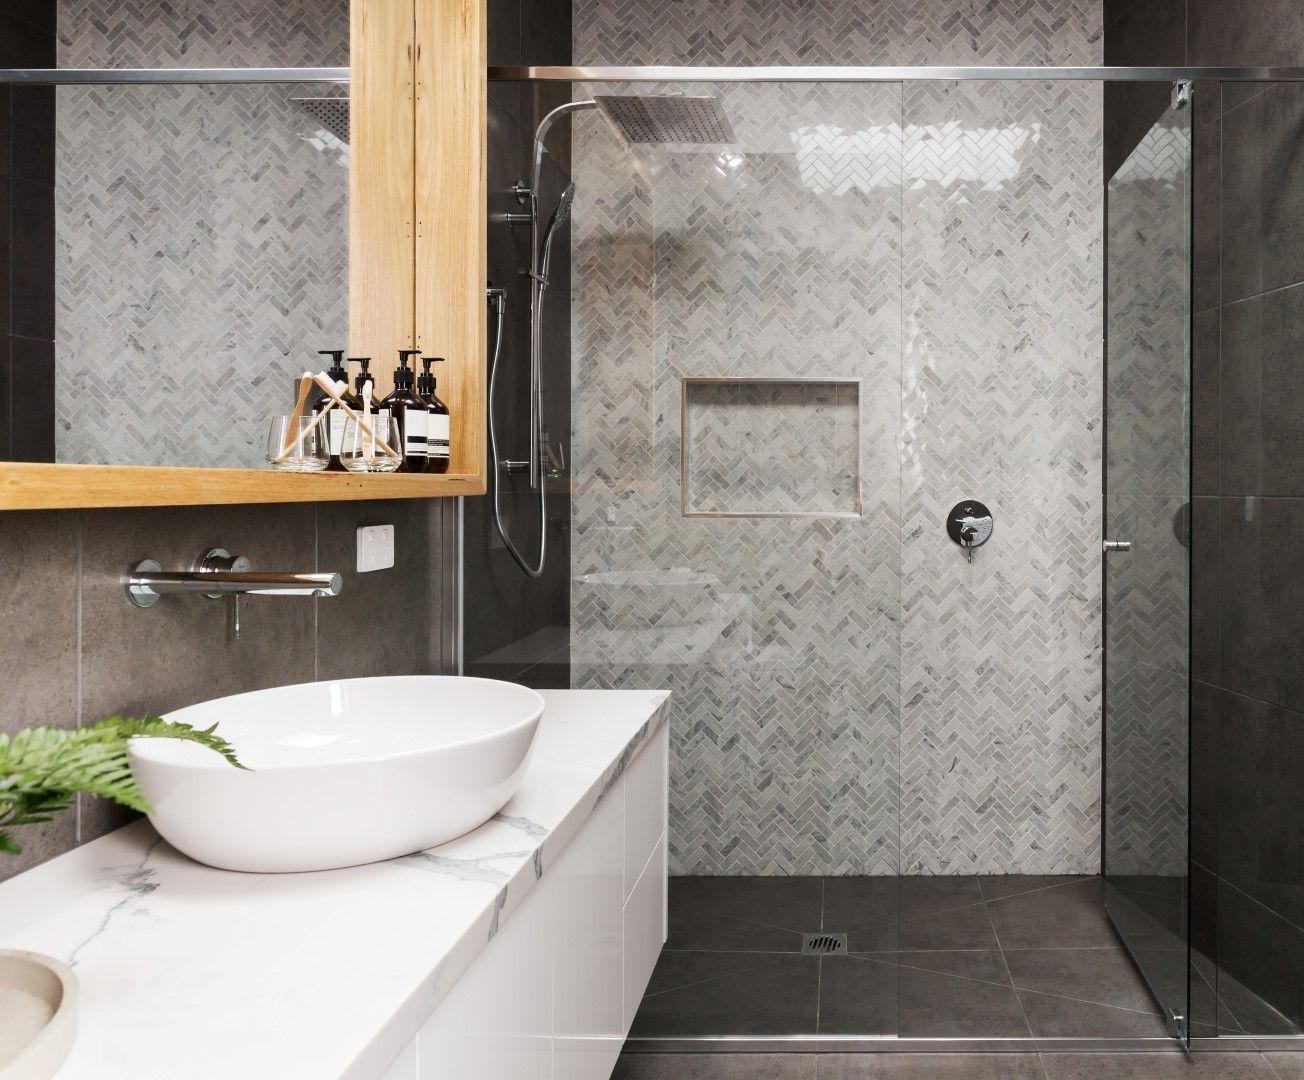 Top 6 Bathroom Tile Trends For 2017 Bathroom Design Small